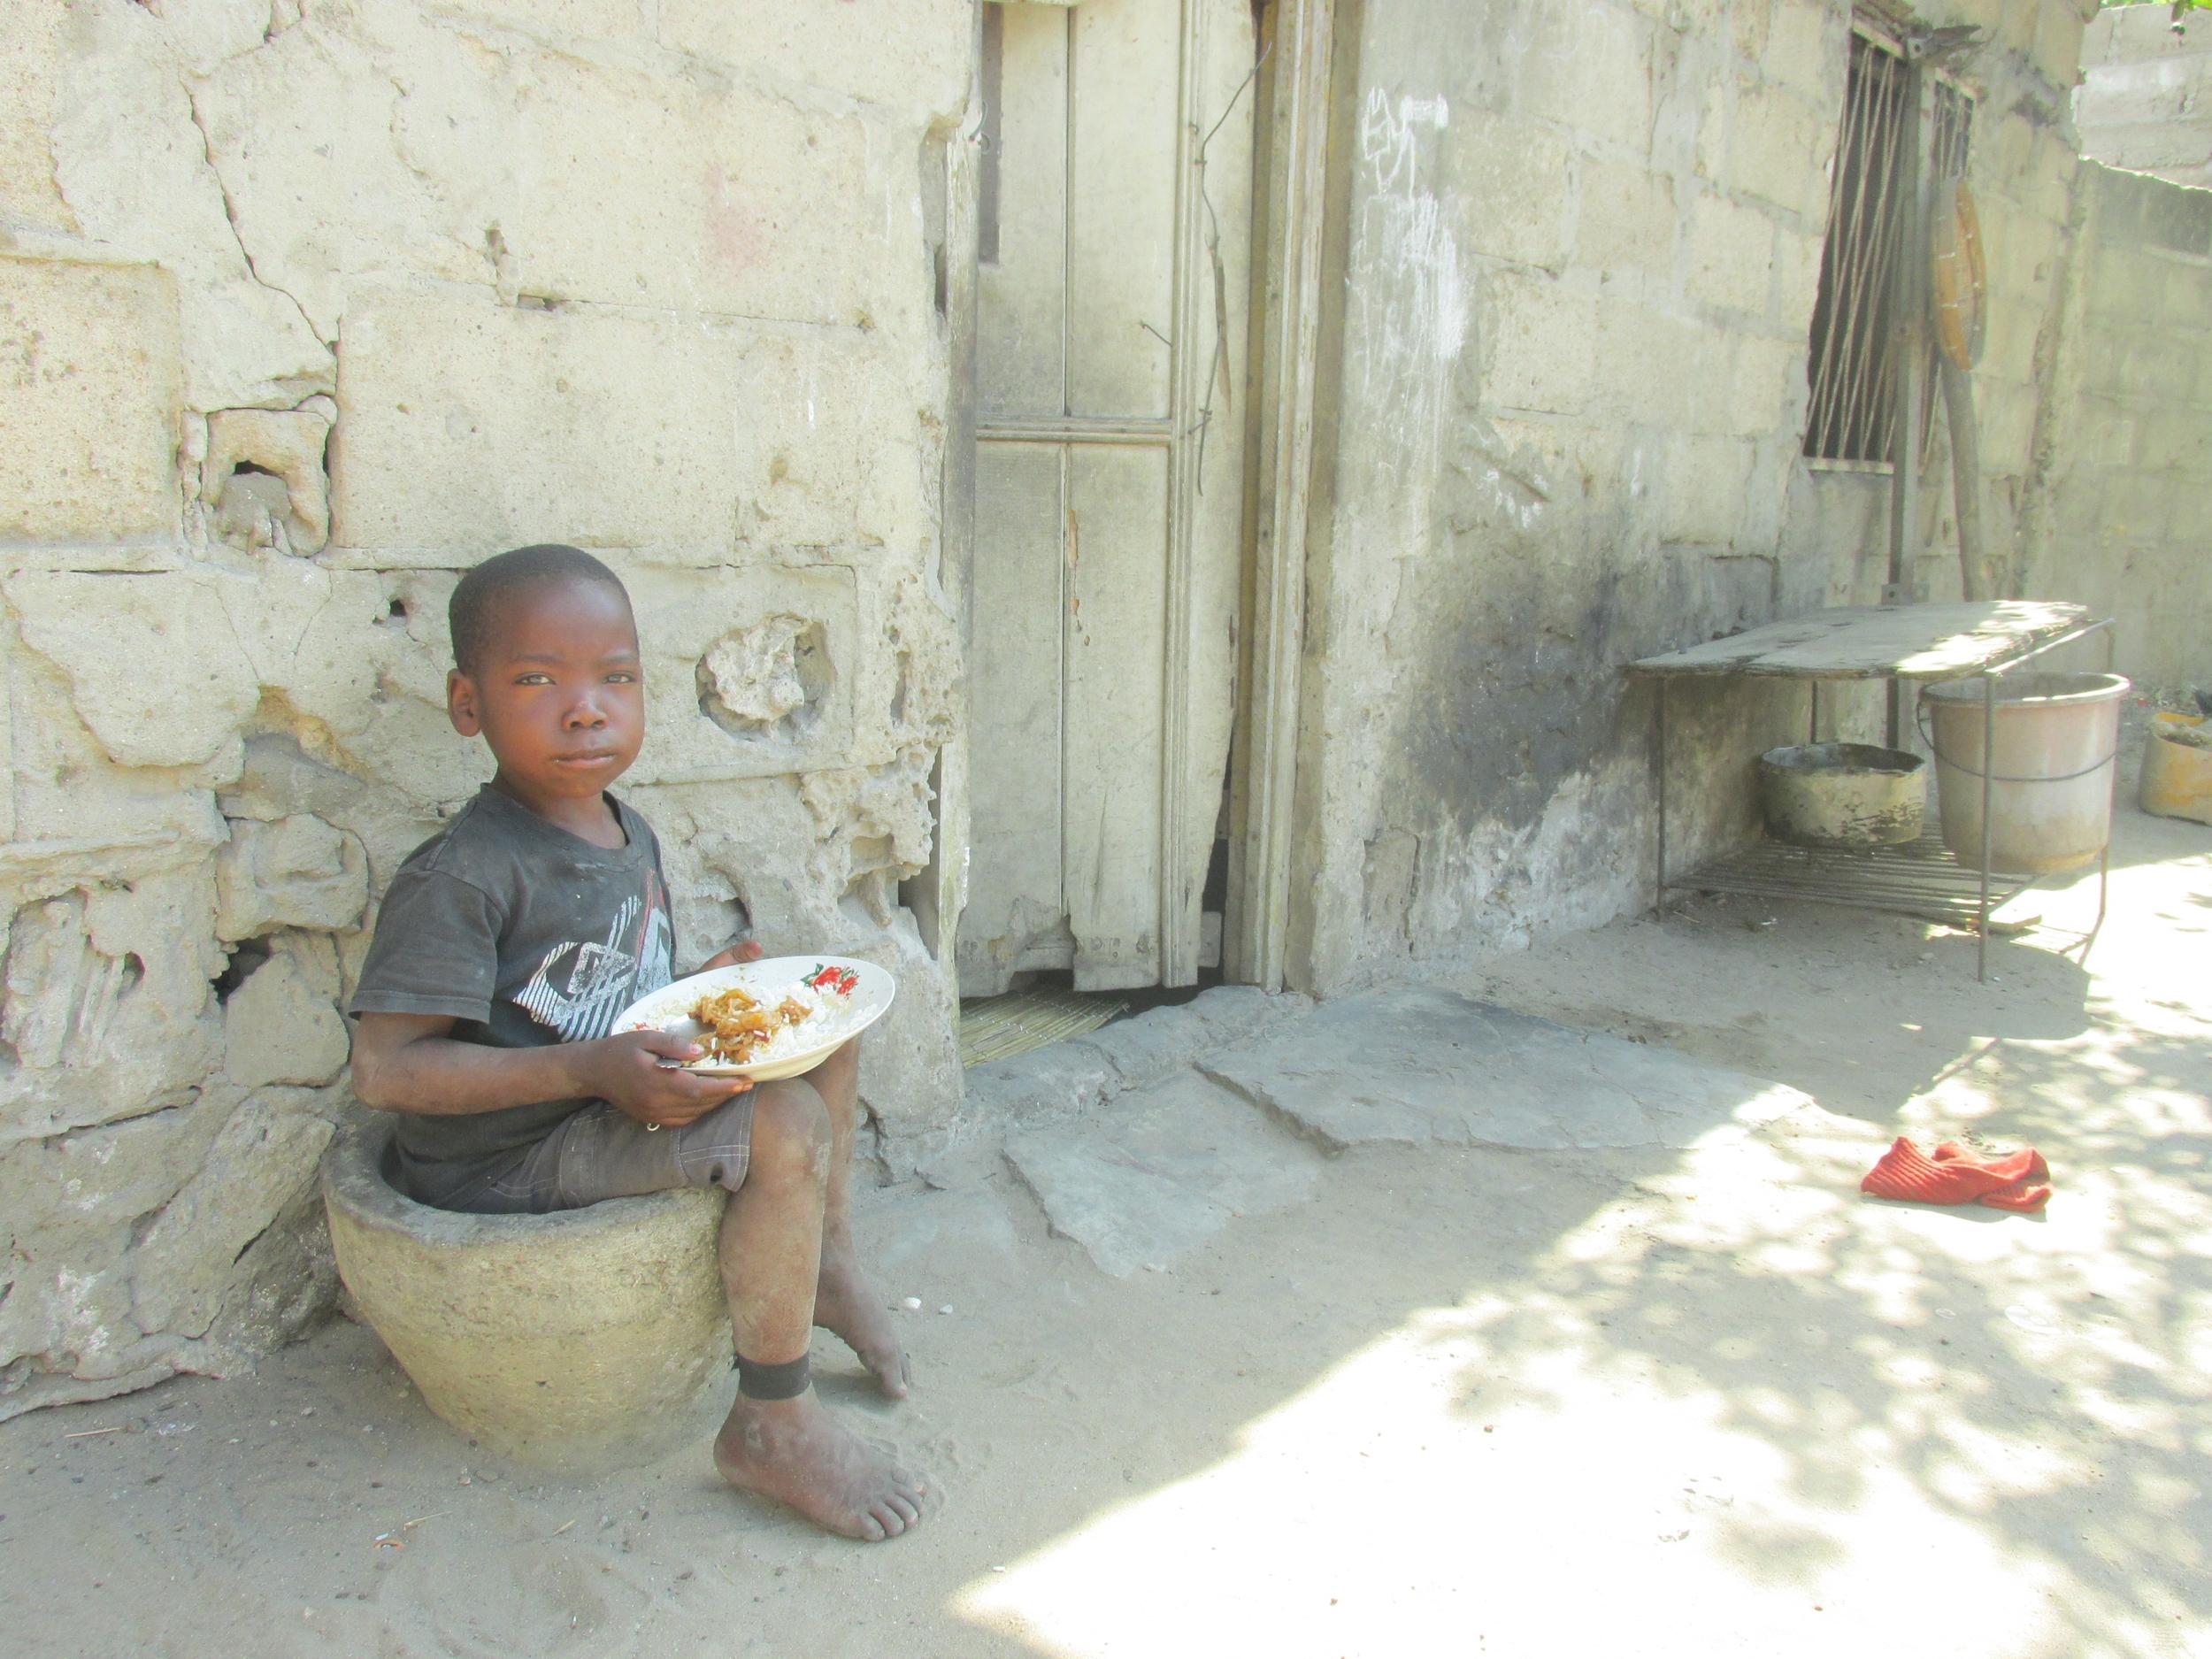 Partner Story: Meninos de Moçambique   from an Egmont partner in Mozambique